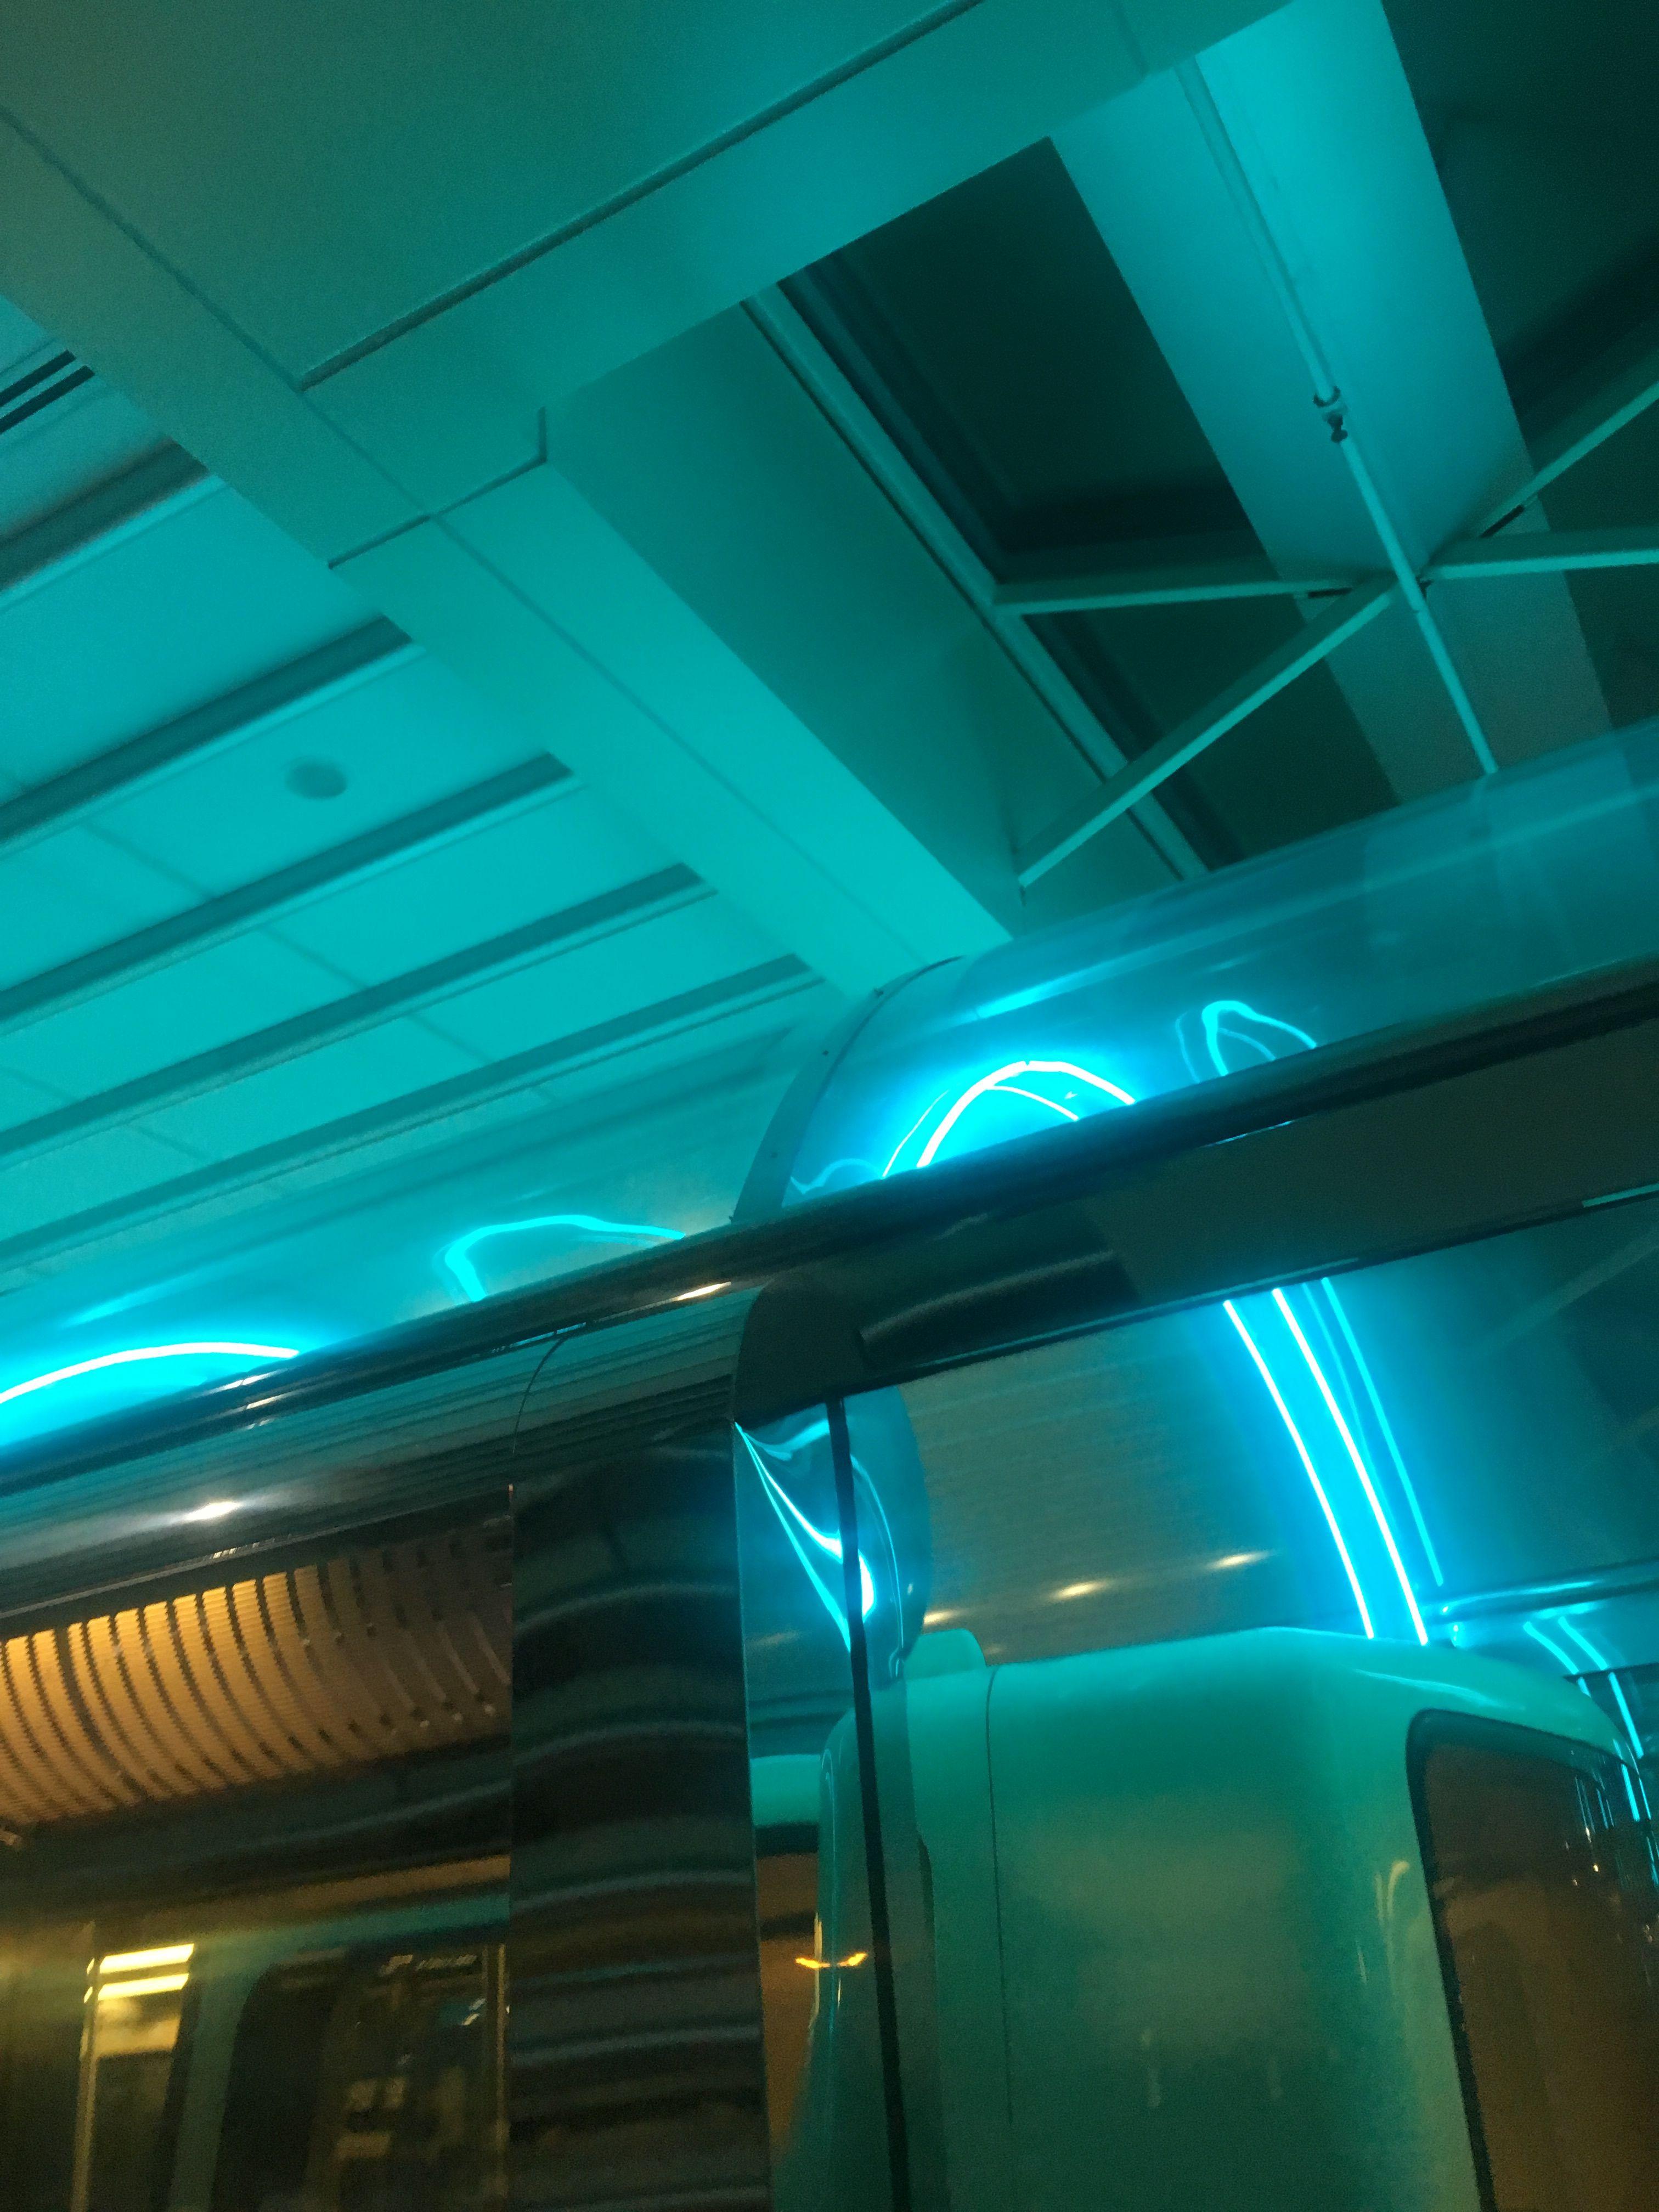 Turquoise Light Neon Aesthetic